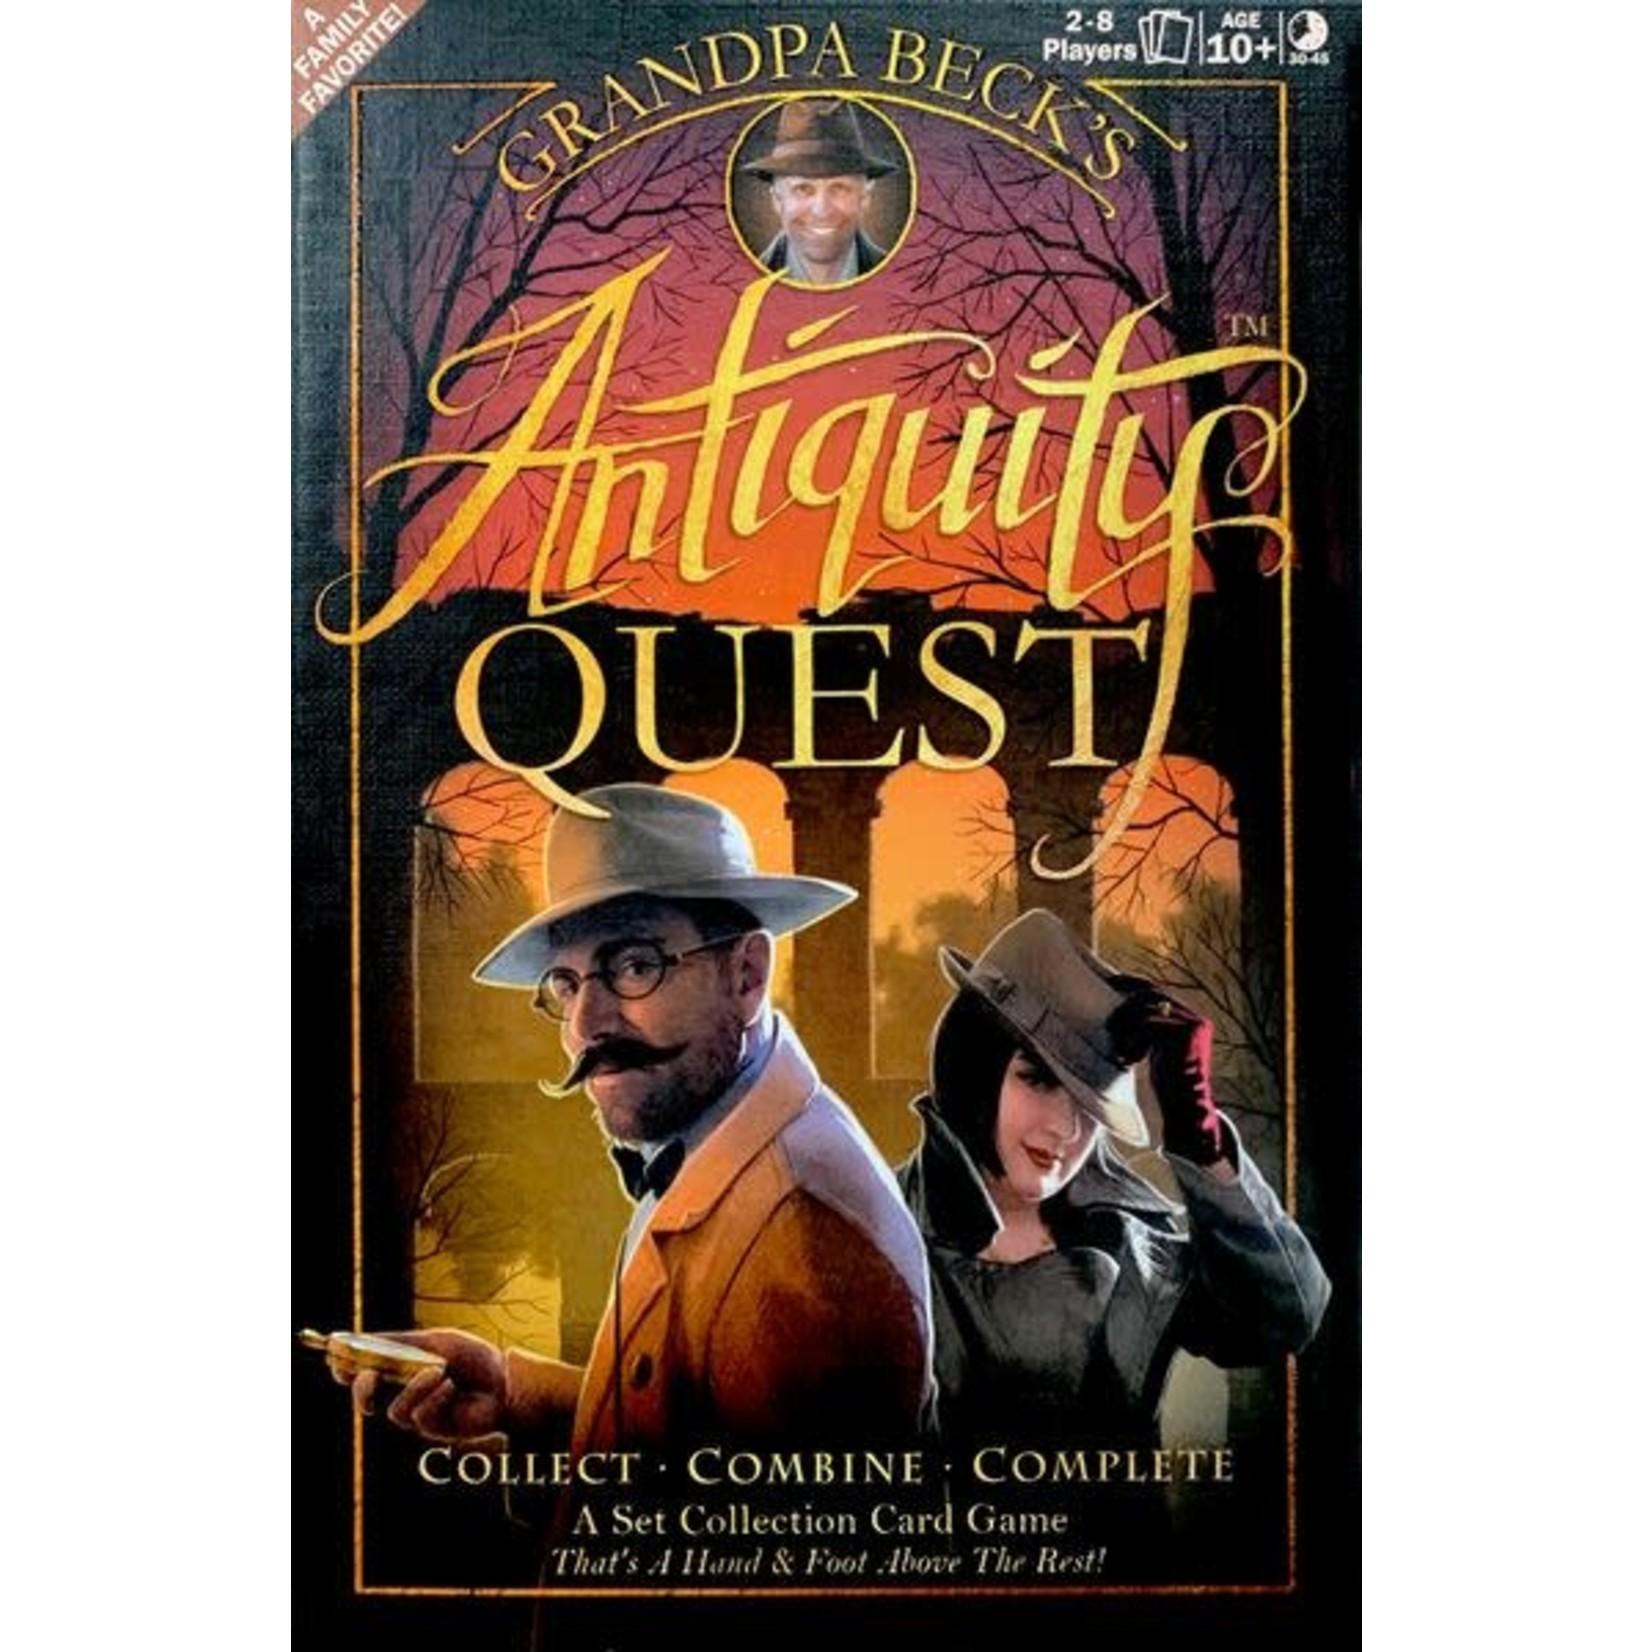 Grandpa Beck's Games Antiquity Quest